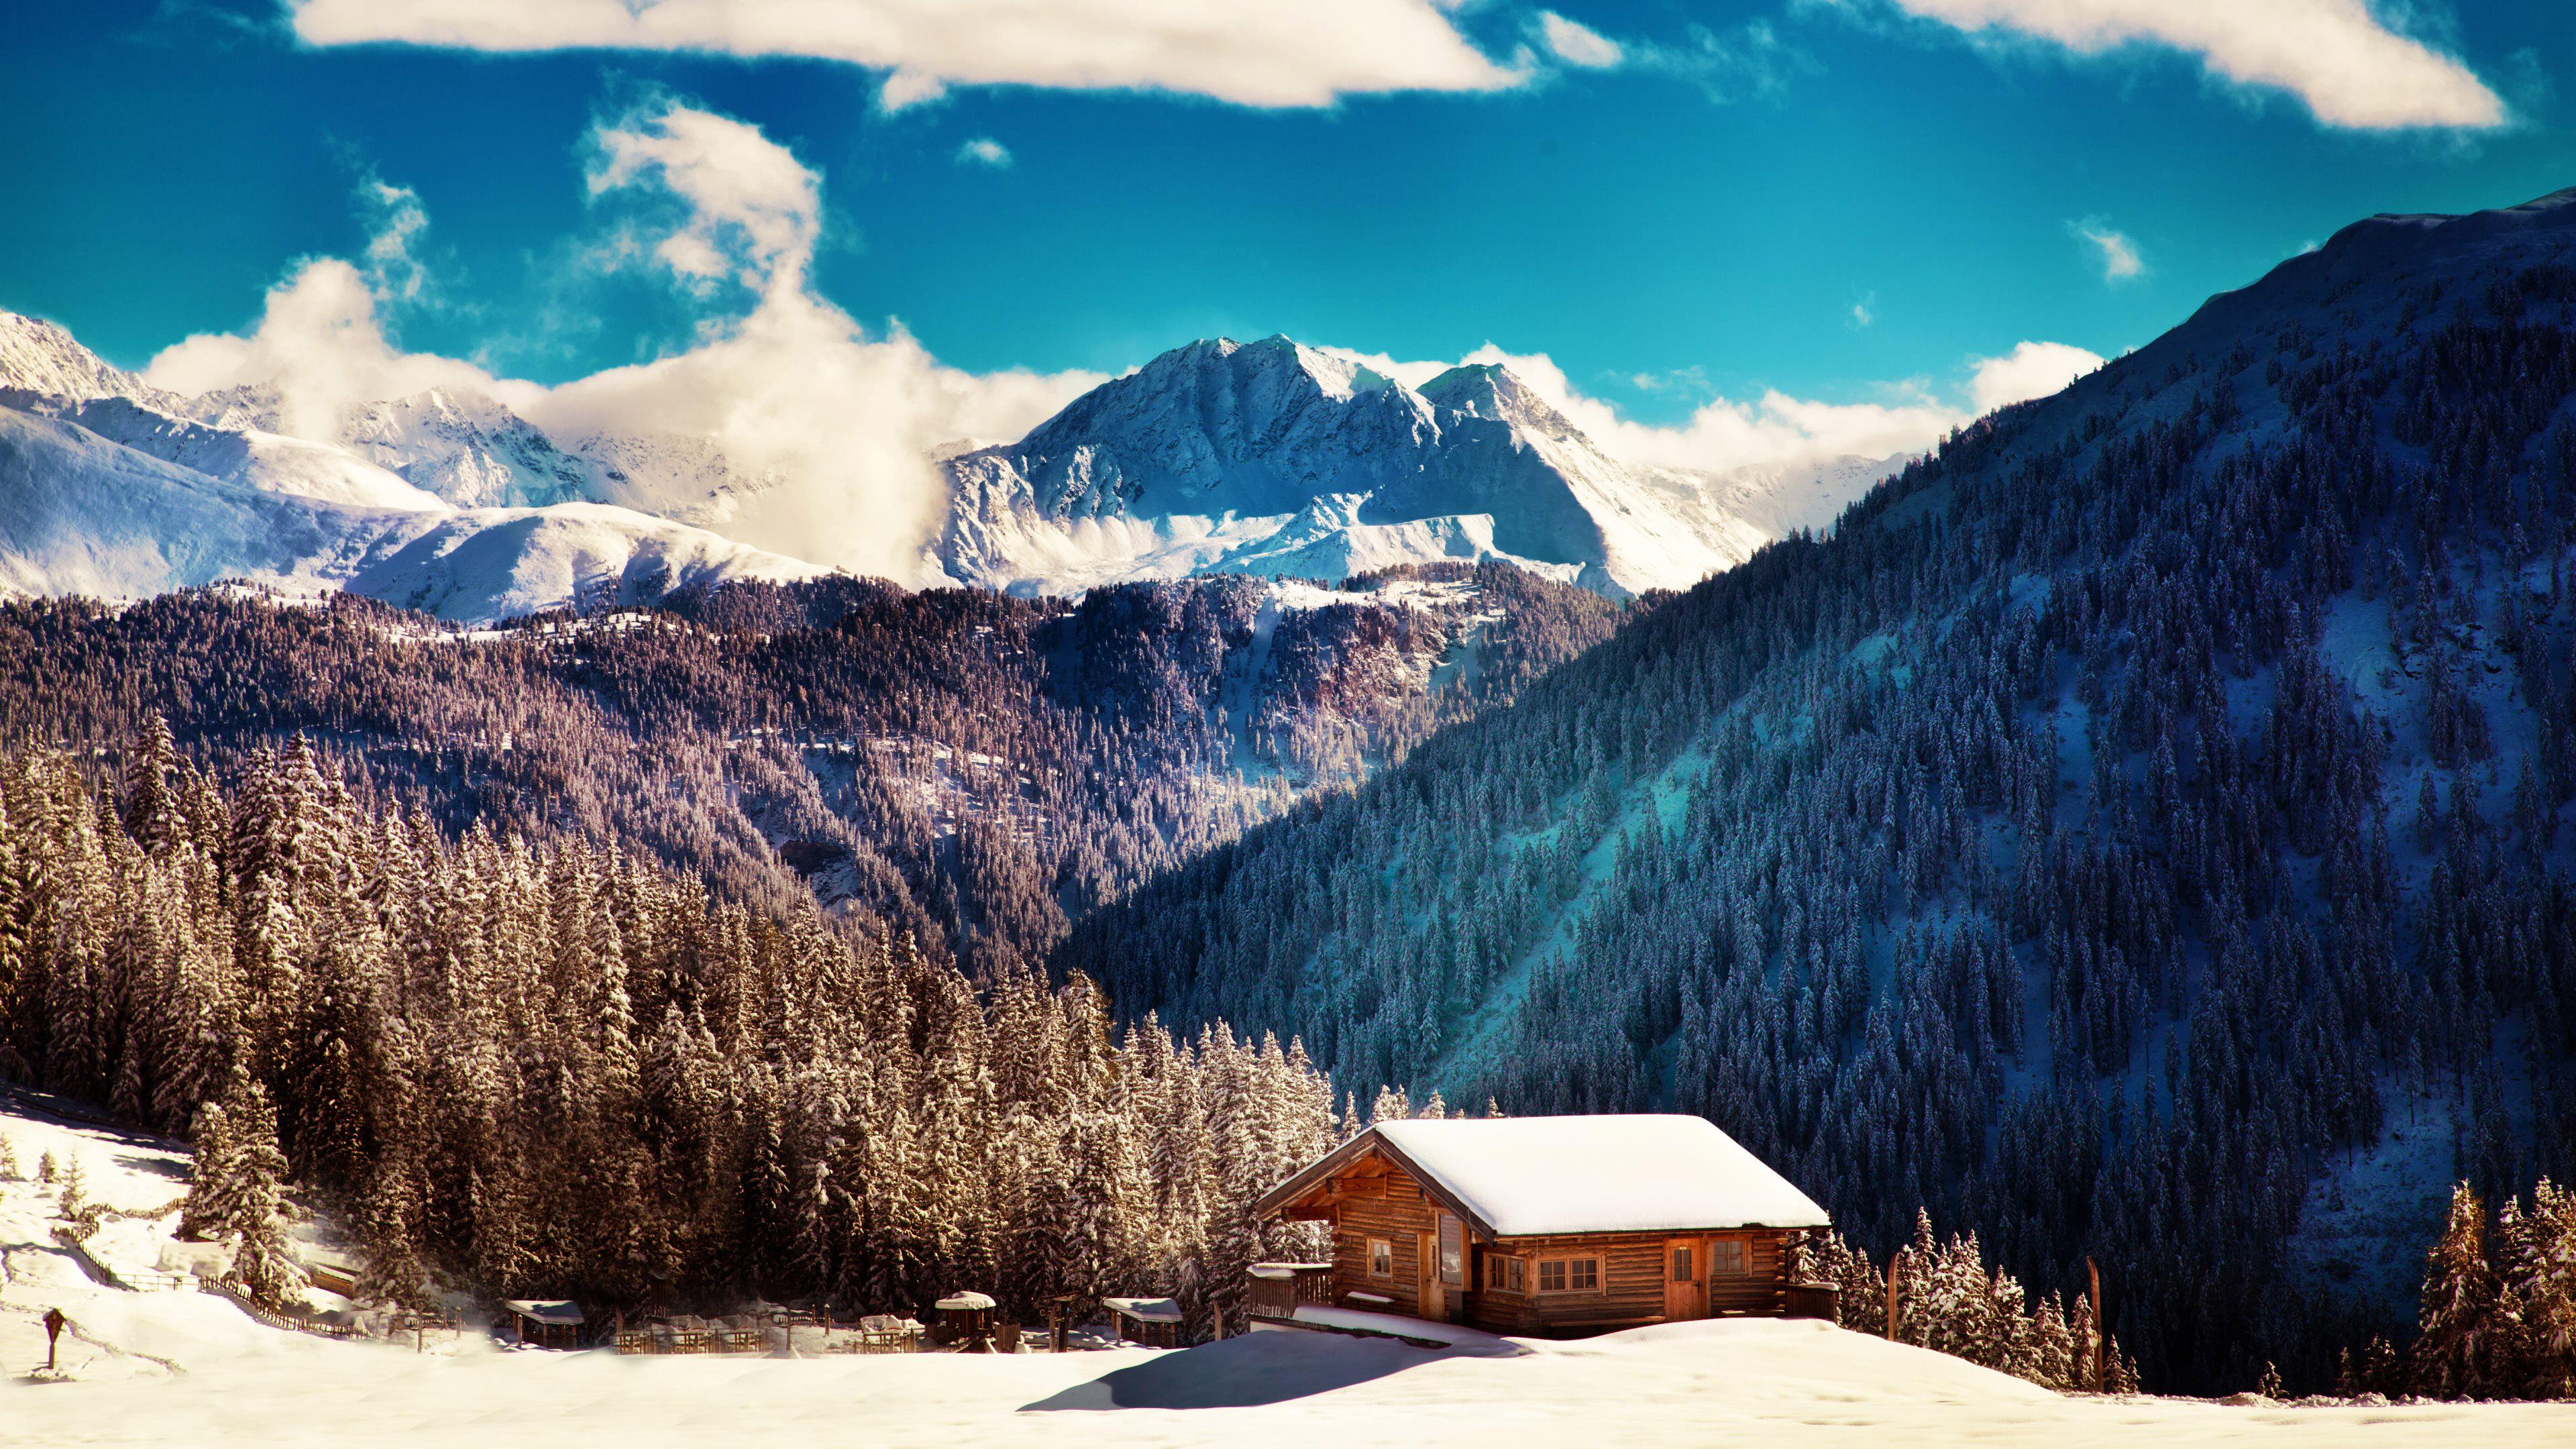 Mountains Winter Landscape House 4k Wallpaper Best Wallpapers